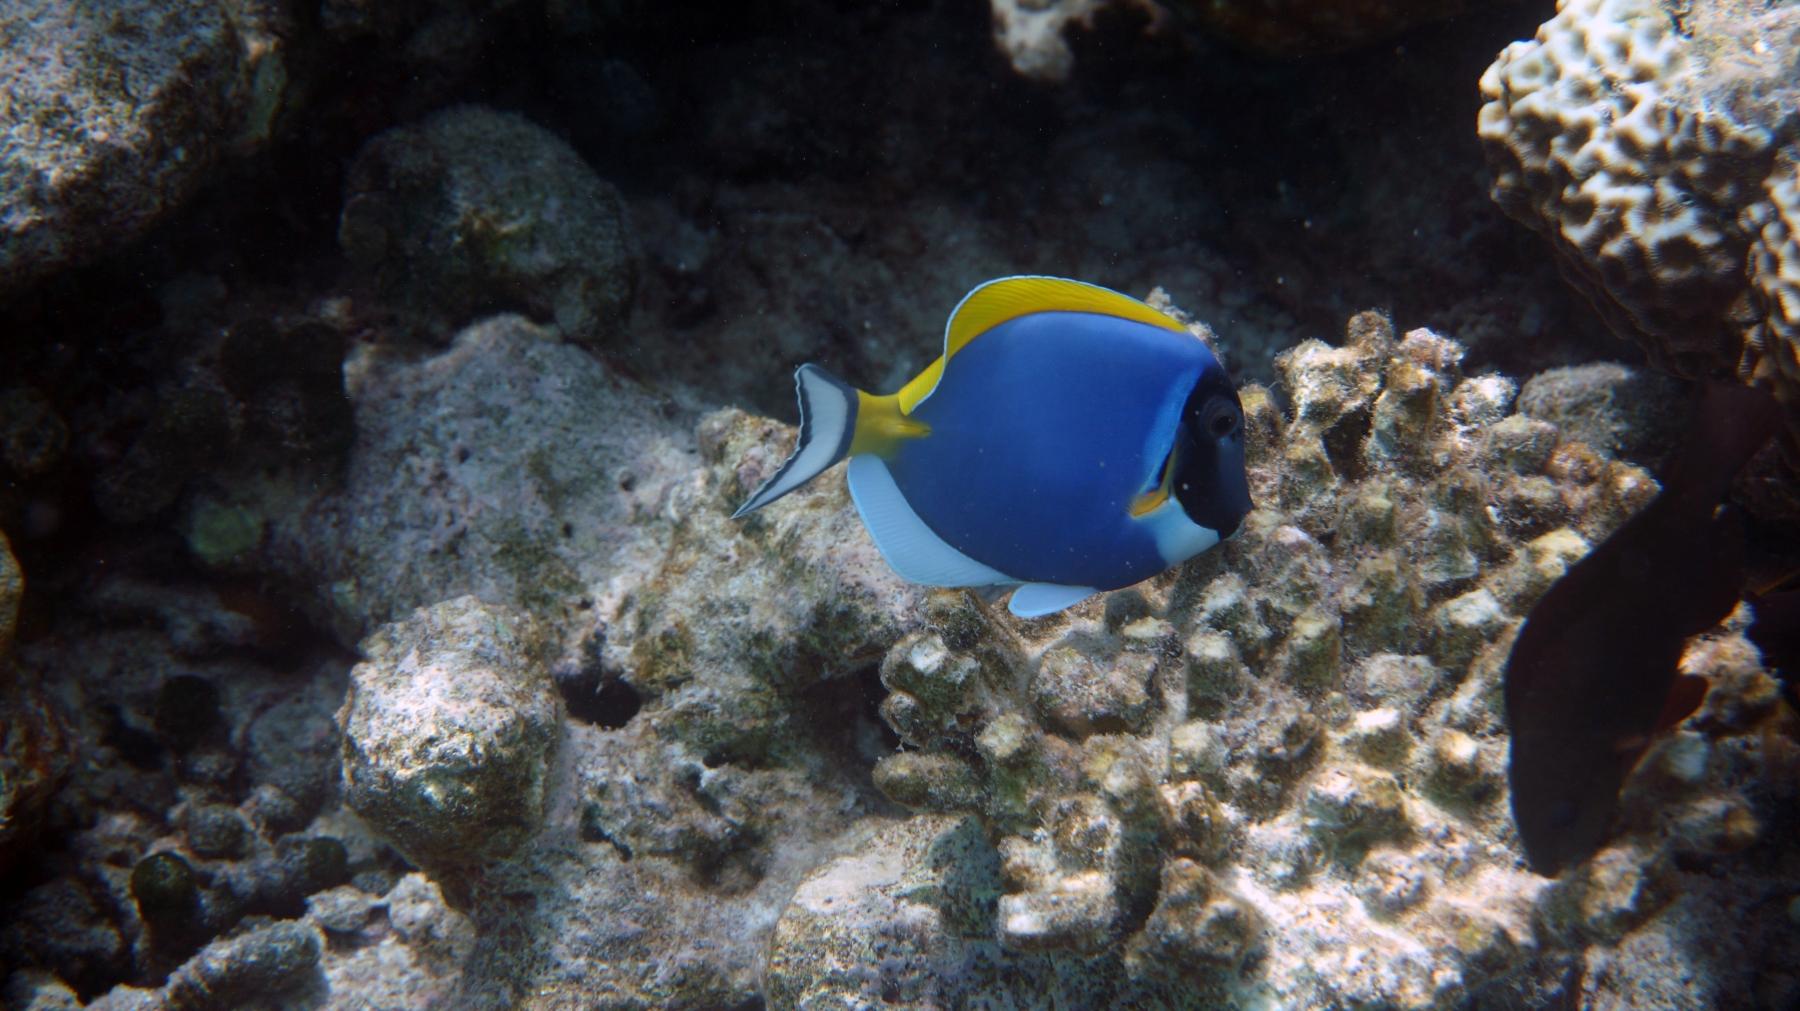 Acanthurus_leucosternon_015_C_Peces-Cirujano_L_Maldivas_U_Sebas_04072015